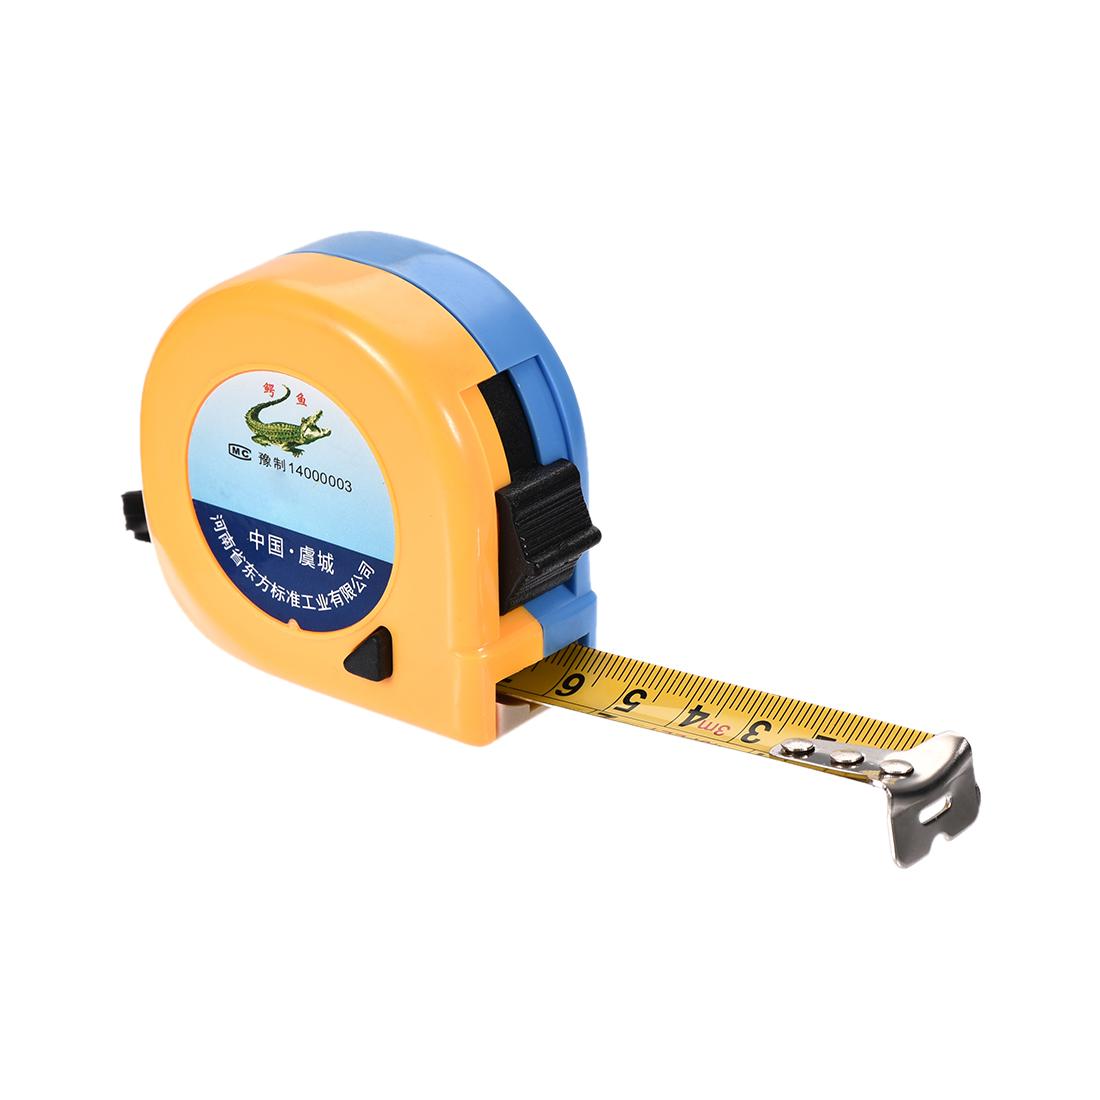 Tape Measure 3 Meter 10 Feet 17mm Width Retractable Metric Plastic Round Case